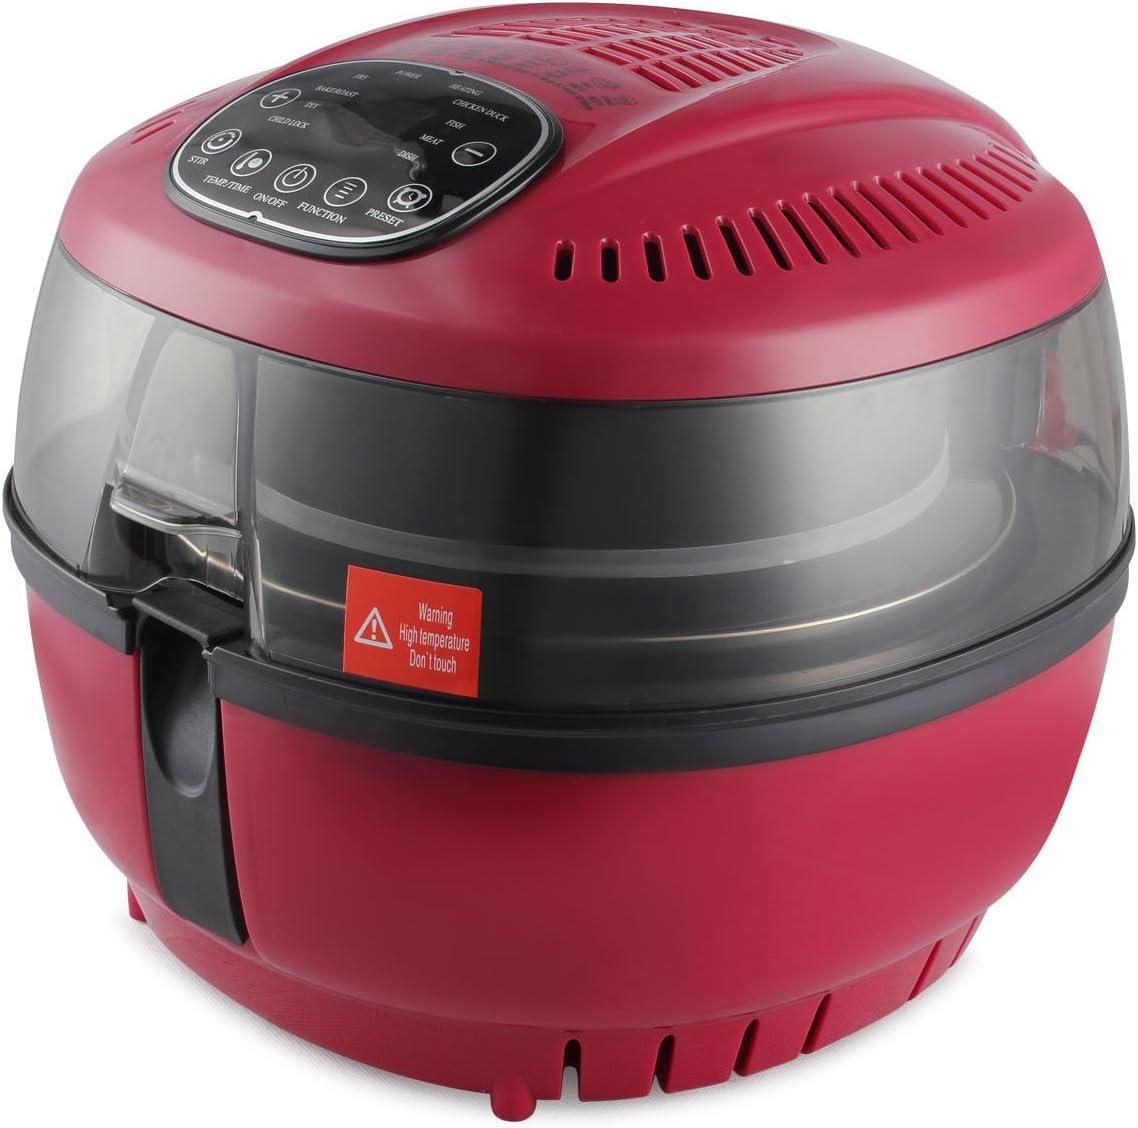 DELLA XL Large Digital Air Fryer Electric 10 Quart 1200W Portable Stirrer Rotisserie Oil Less Roaster Fry Food, Red